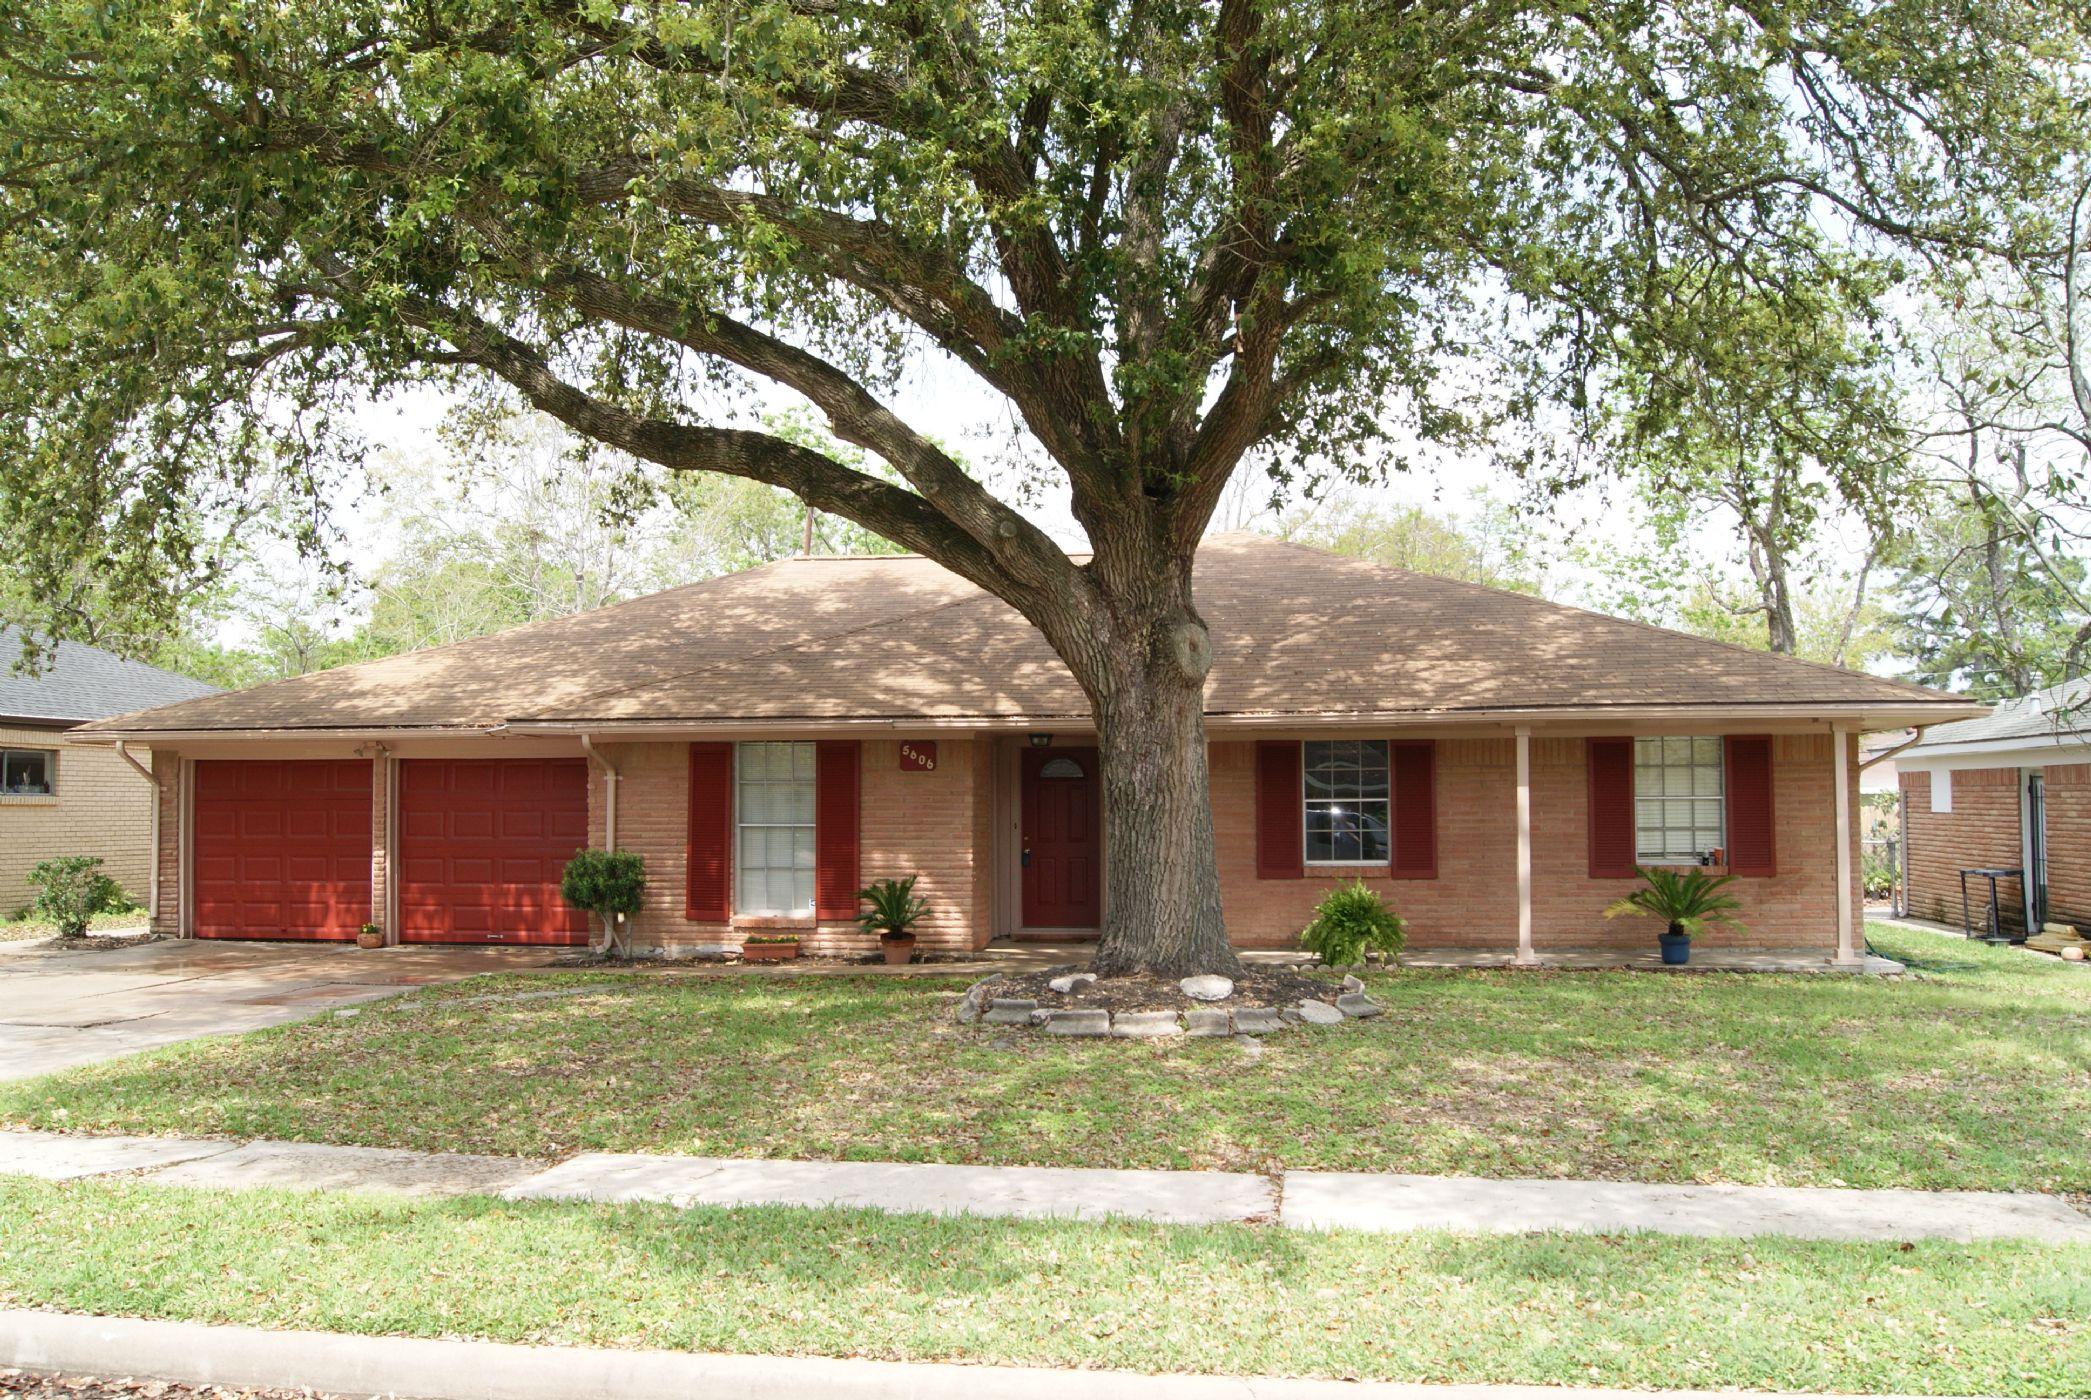 Houston Home, TX Real Estate Listing